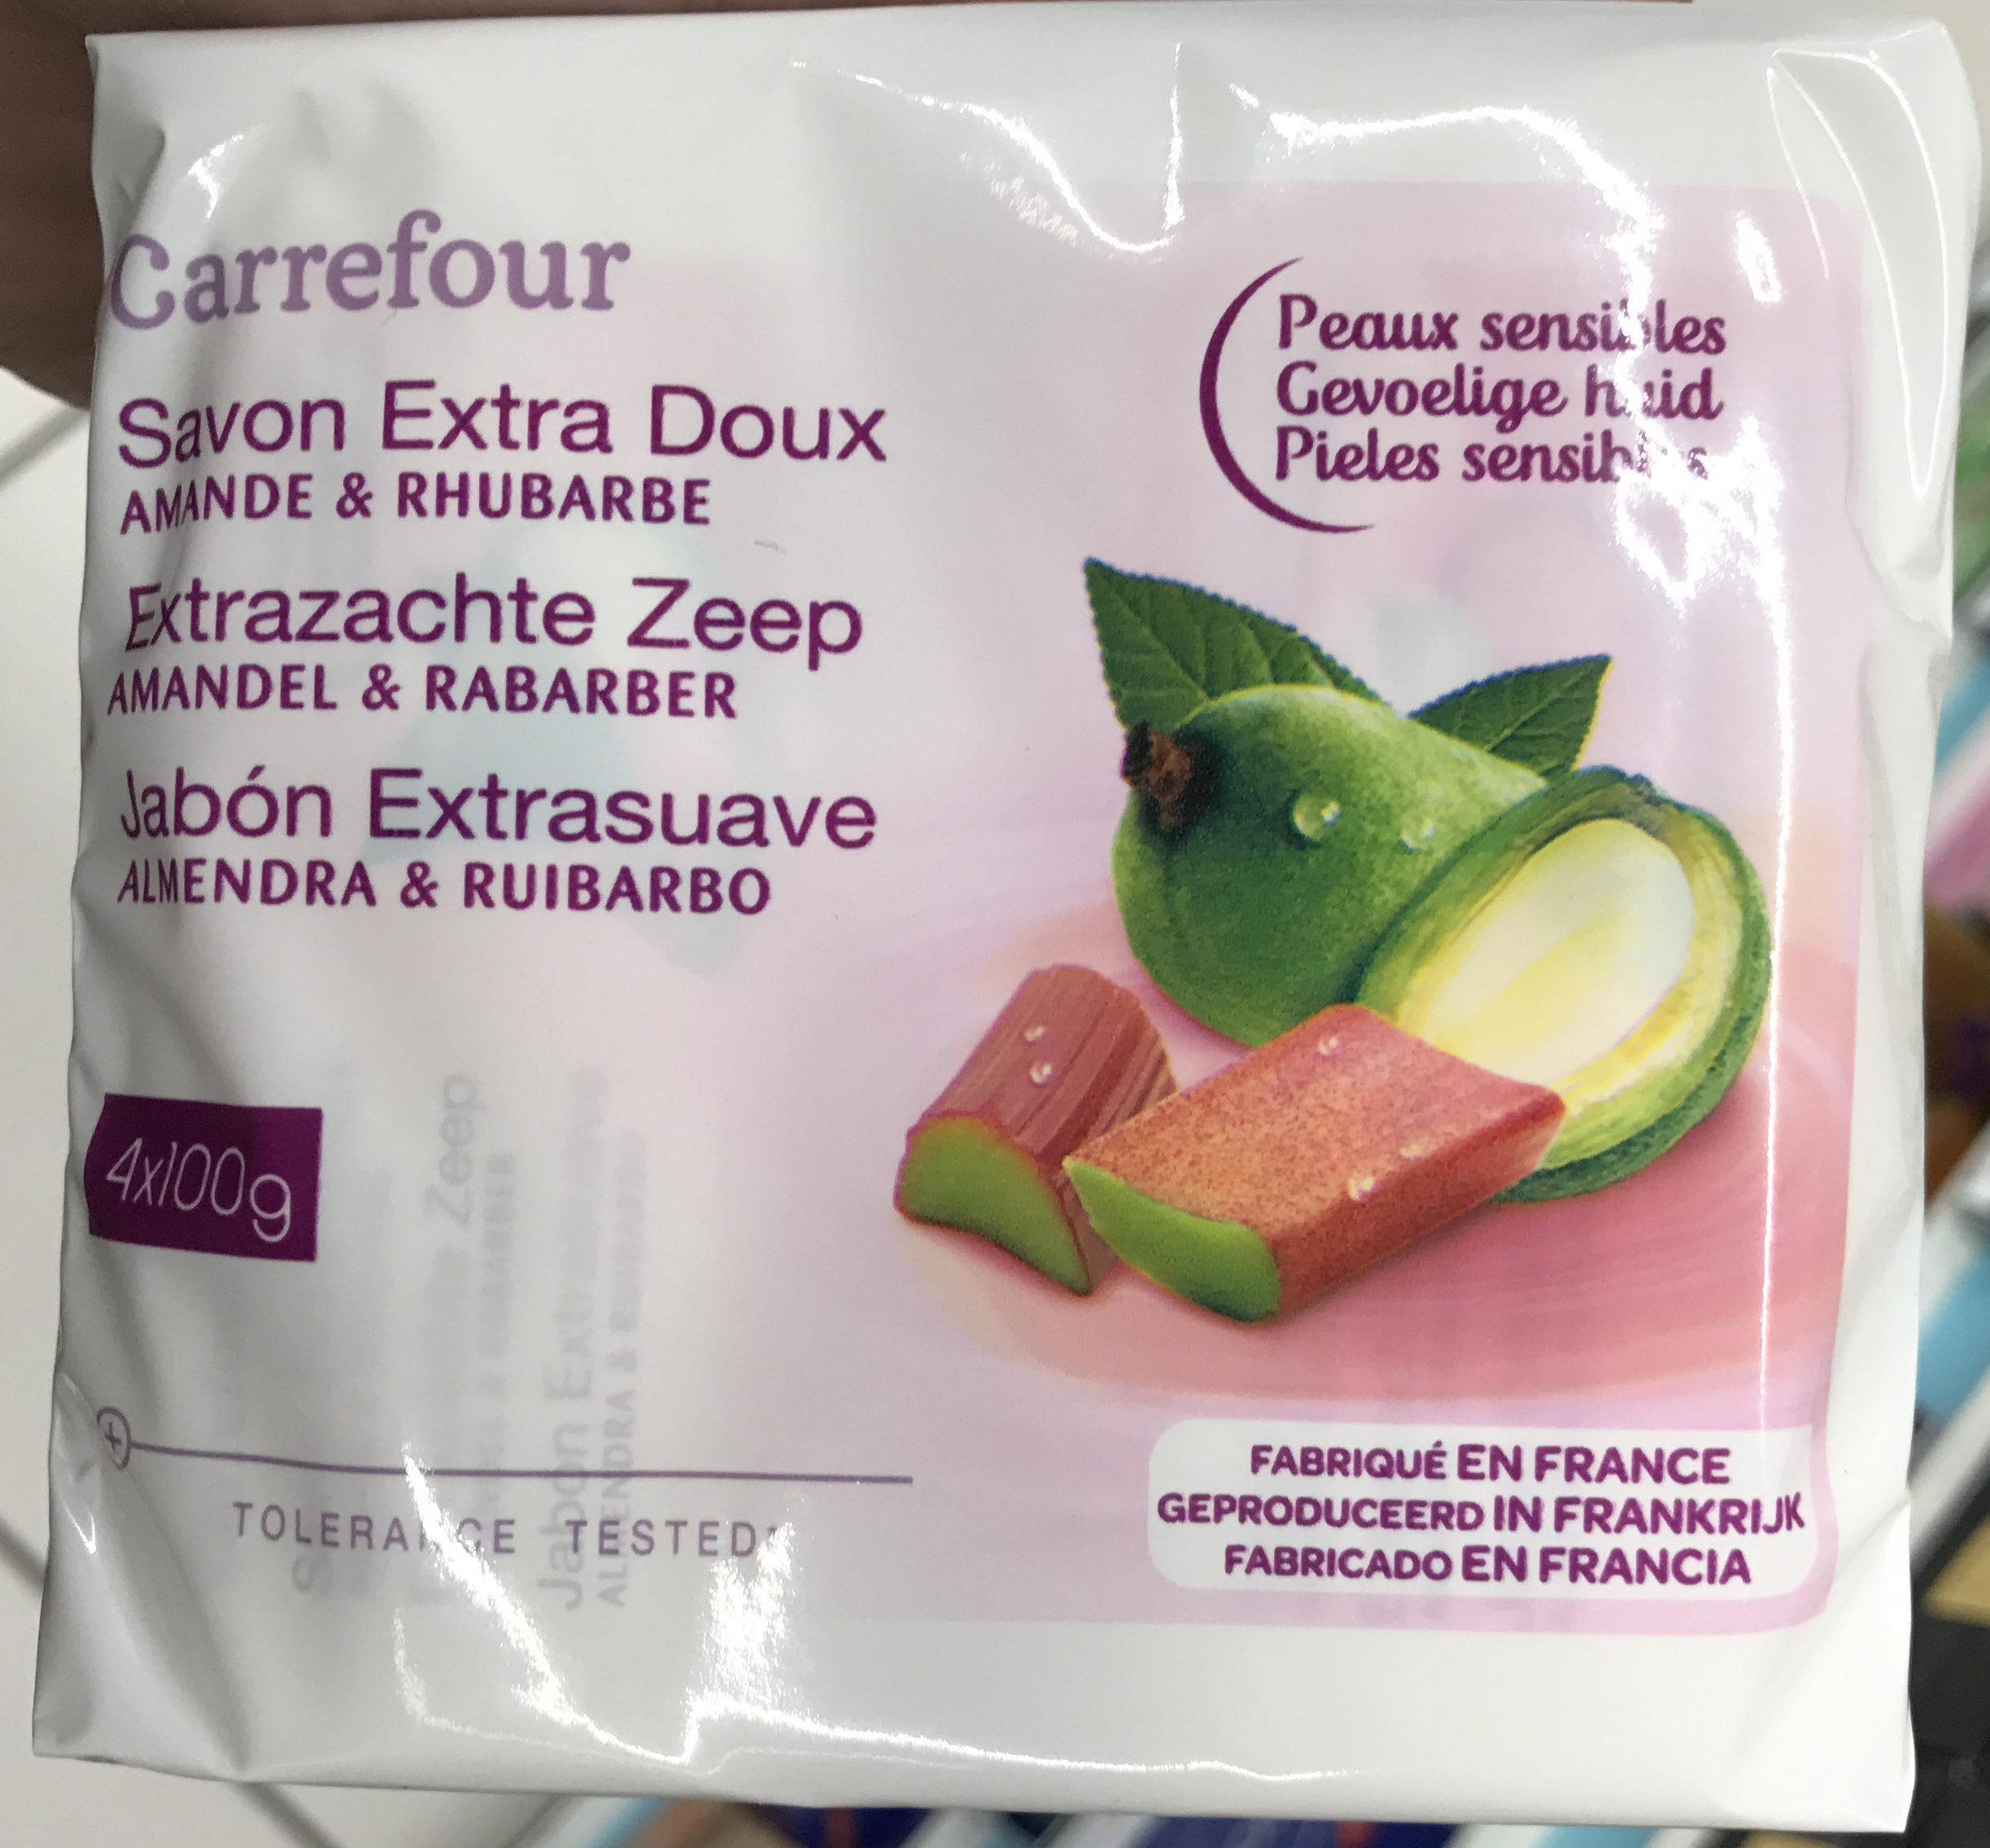 Savon extra doux Amande & Rhubarbe - Produit - fr